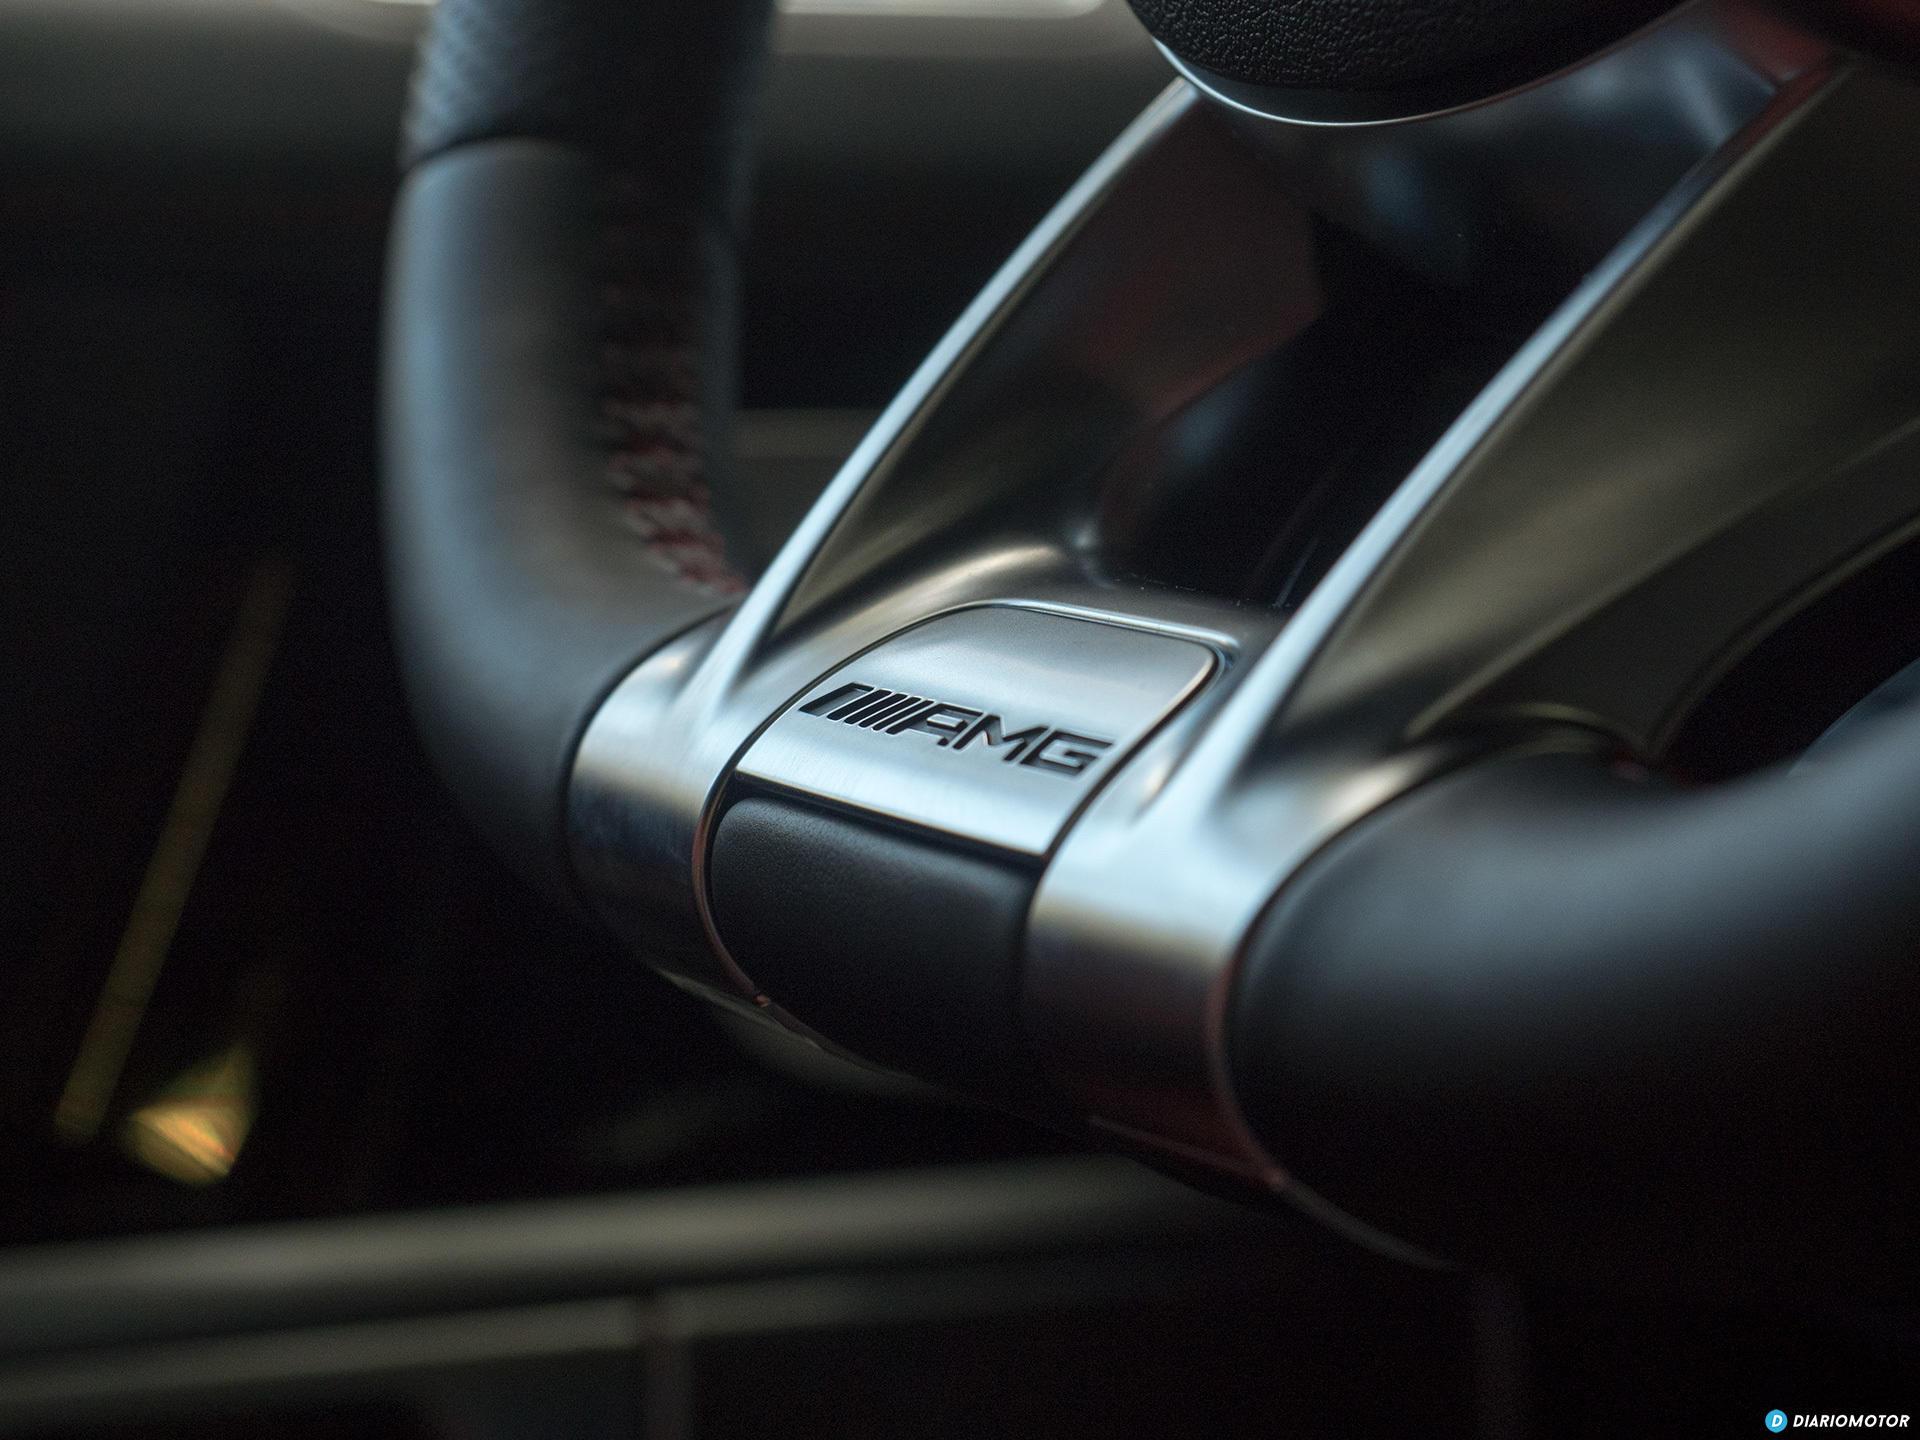 Mercedes Amg G 63 Interior 00001